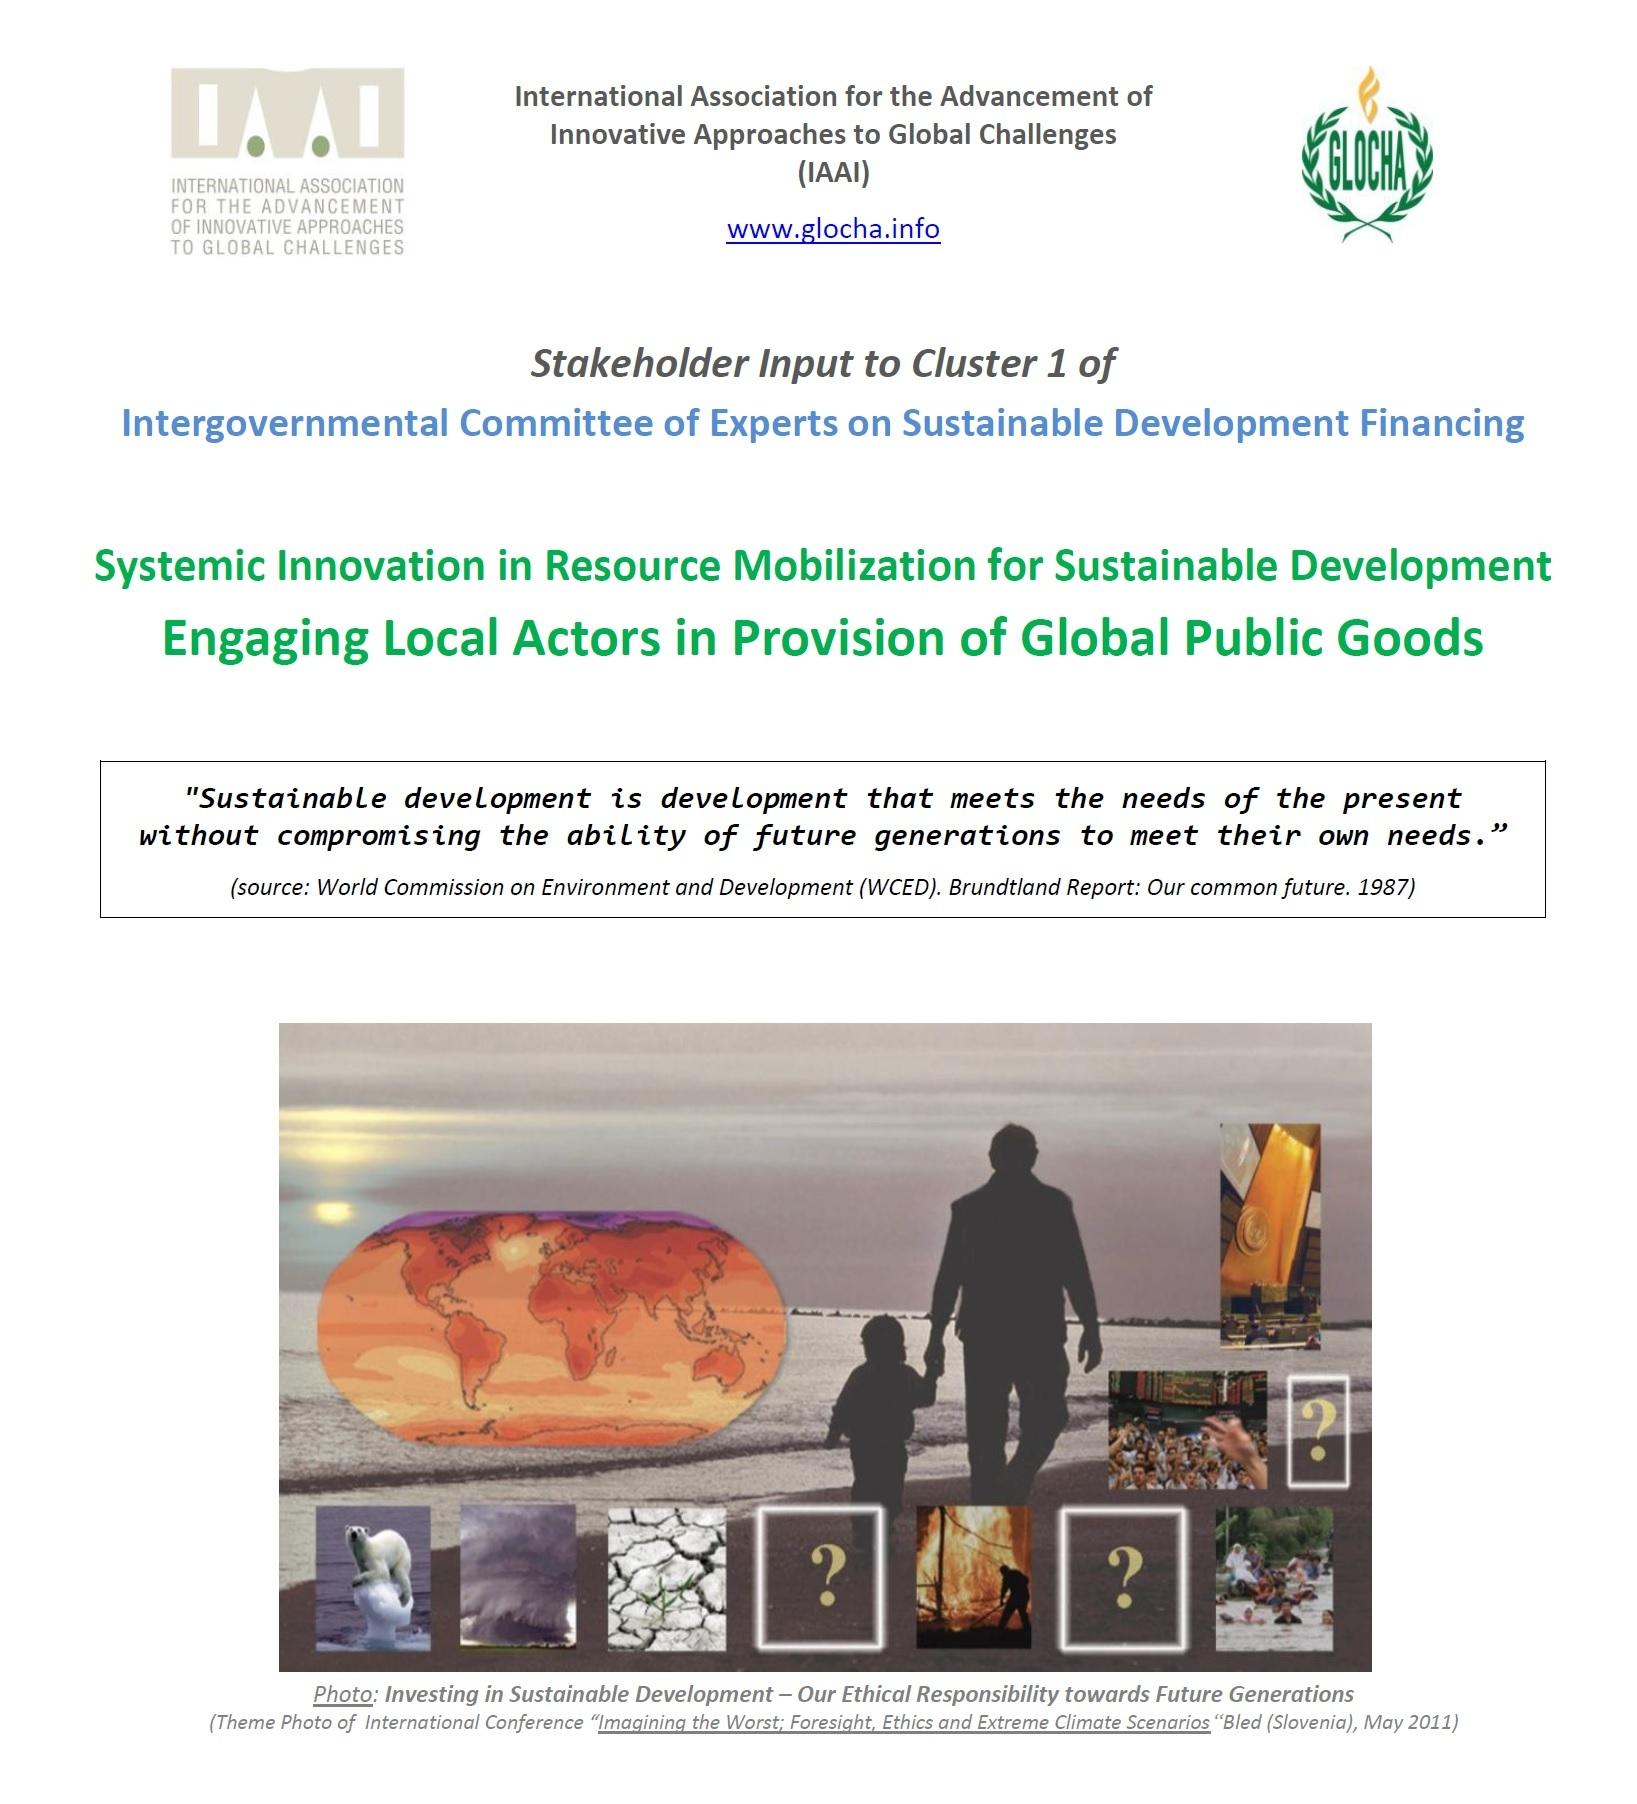 SD FinancingExpertCommittee Cluster 1 StakeholderInput IAAI cover